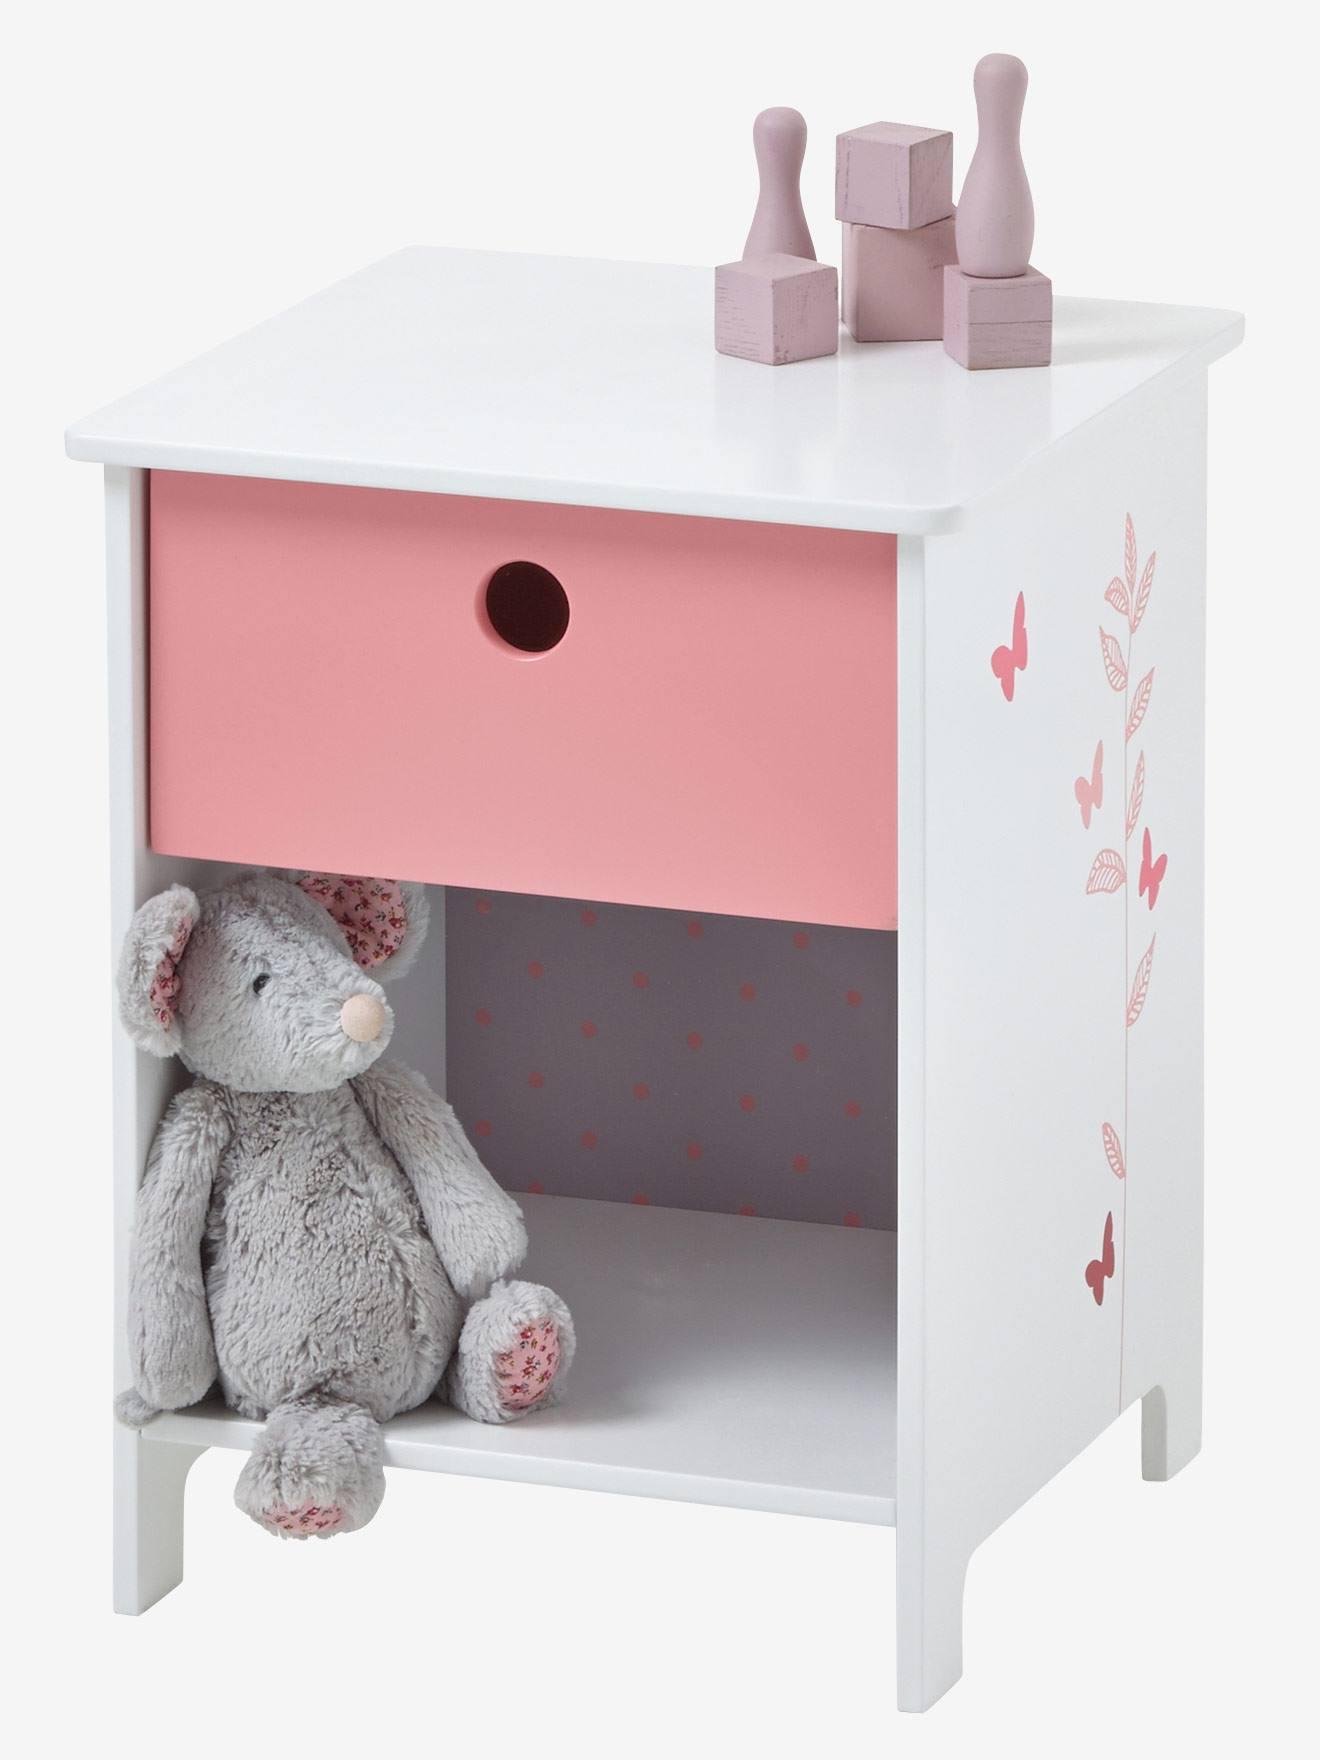 vertbaudet barentin magasin de meuble cambrai best of magasin salle de bain barentin et votre. Black Bedroom Furniture Sets. Home Design Ideas